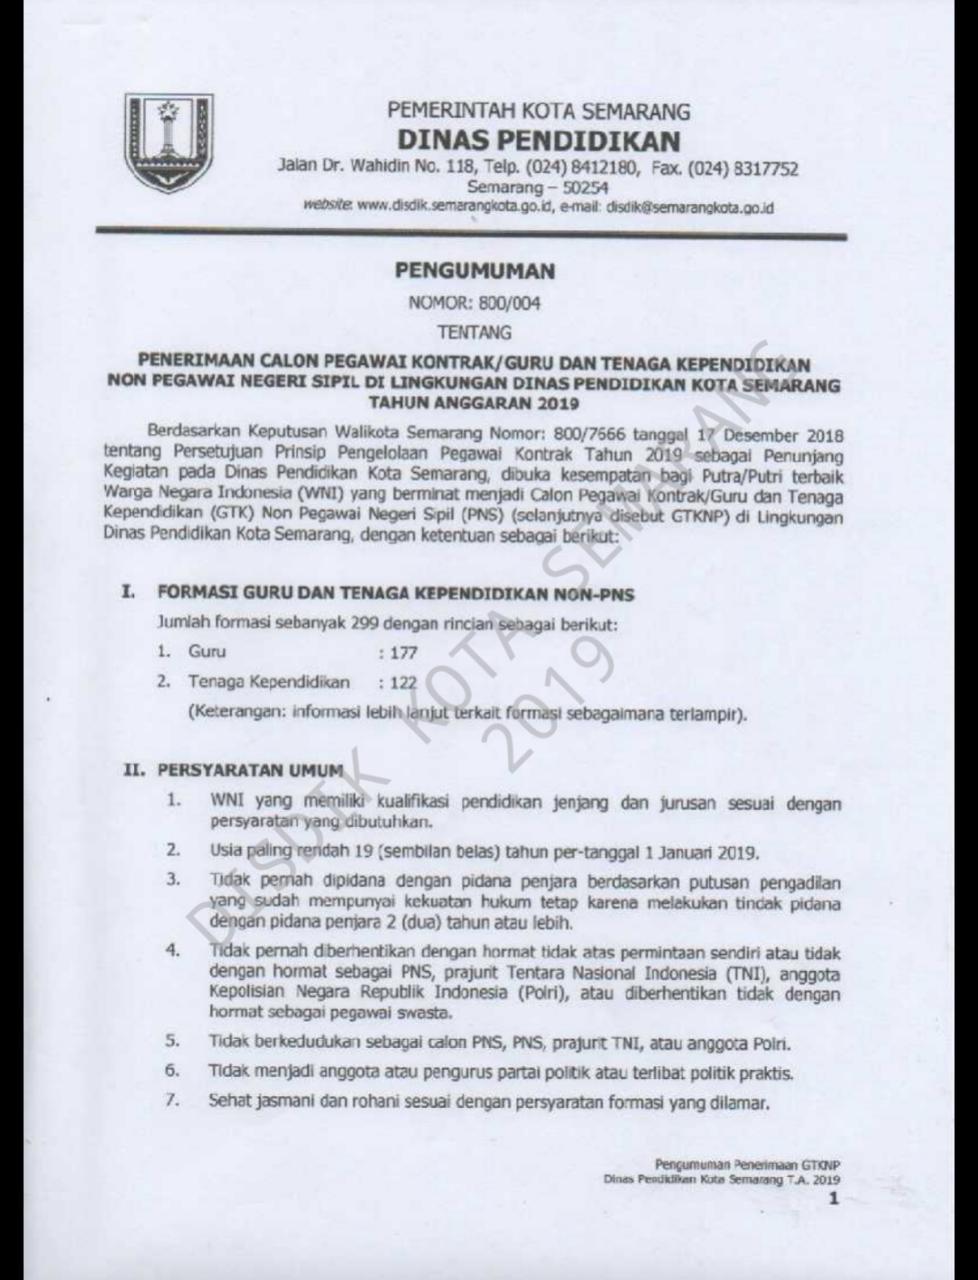 Lowongan Kerja Lowongan Kerja Dinas Pendidikan Semarang 2019